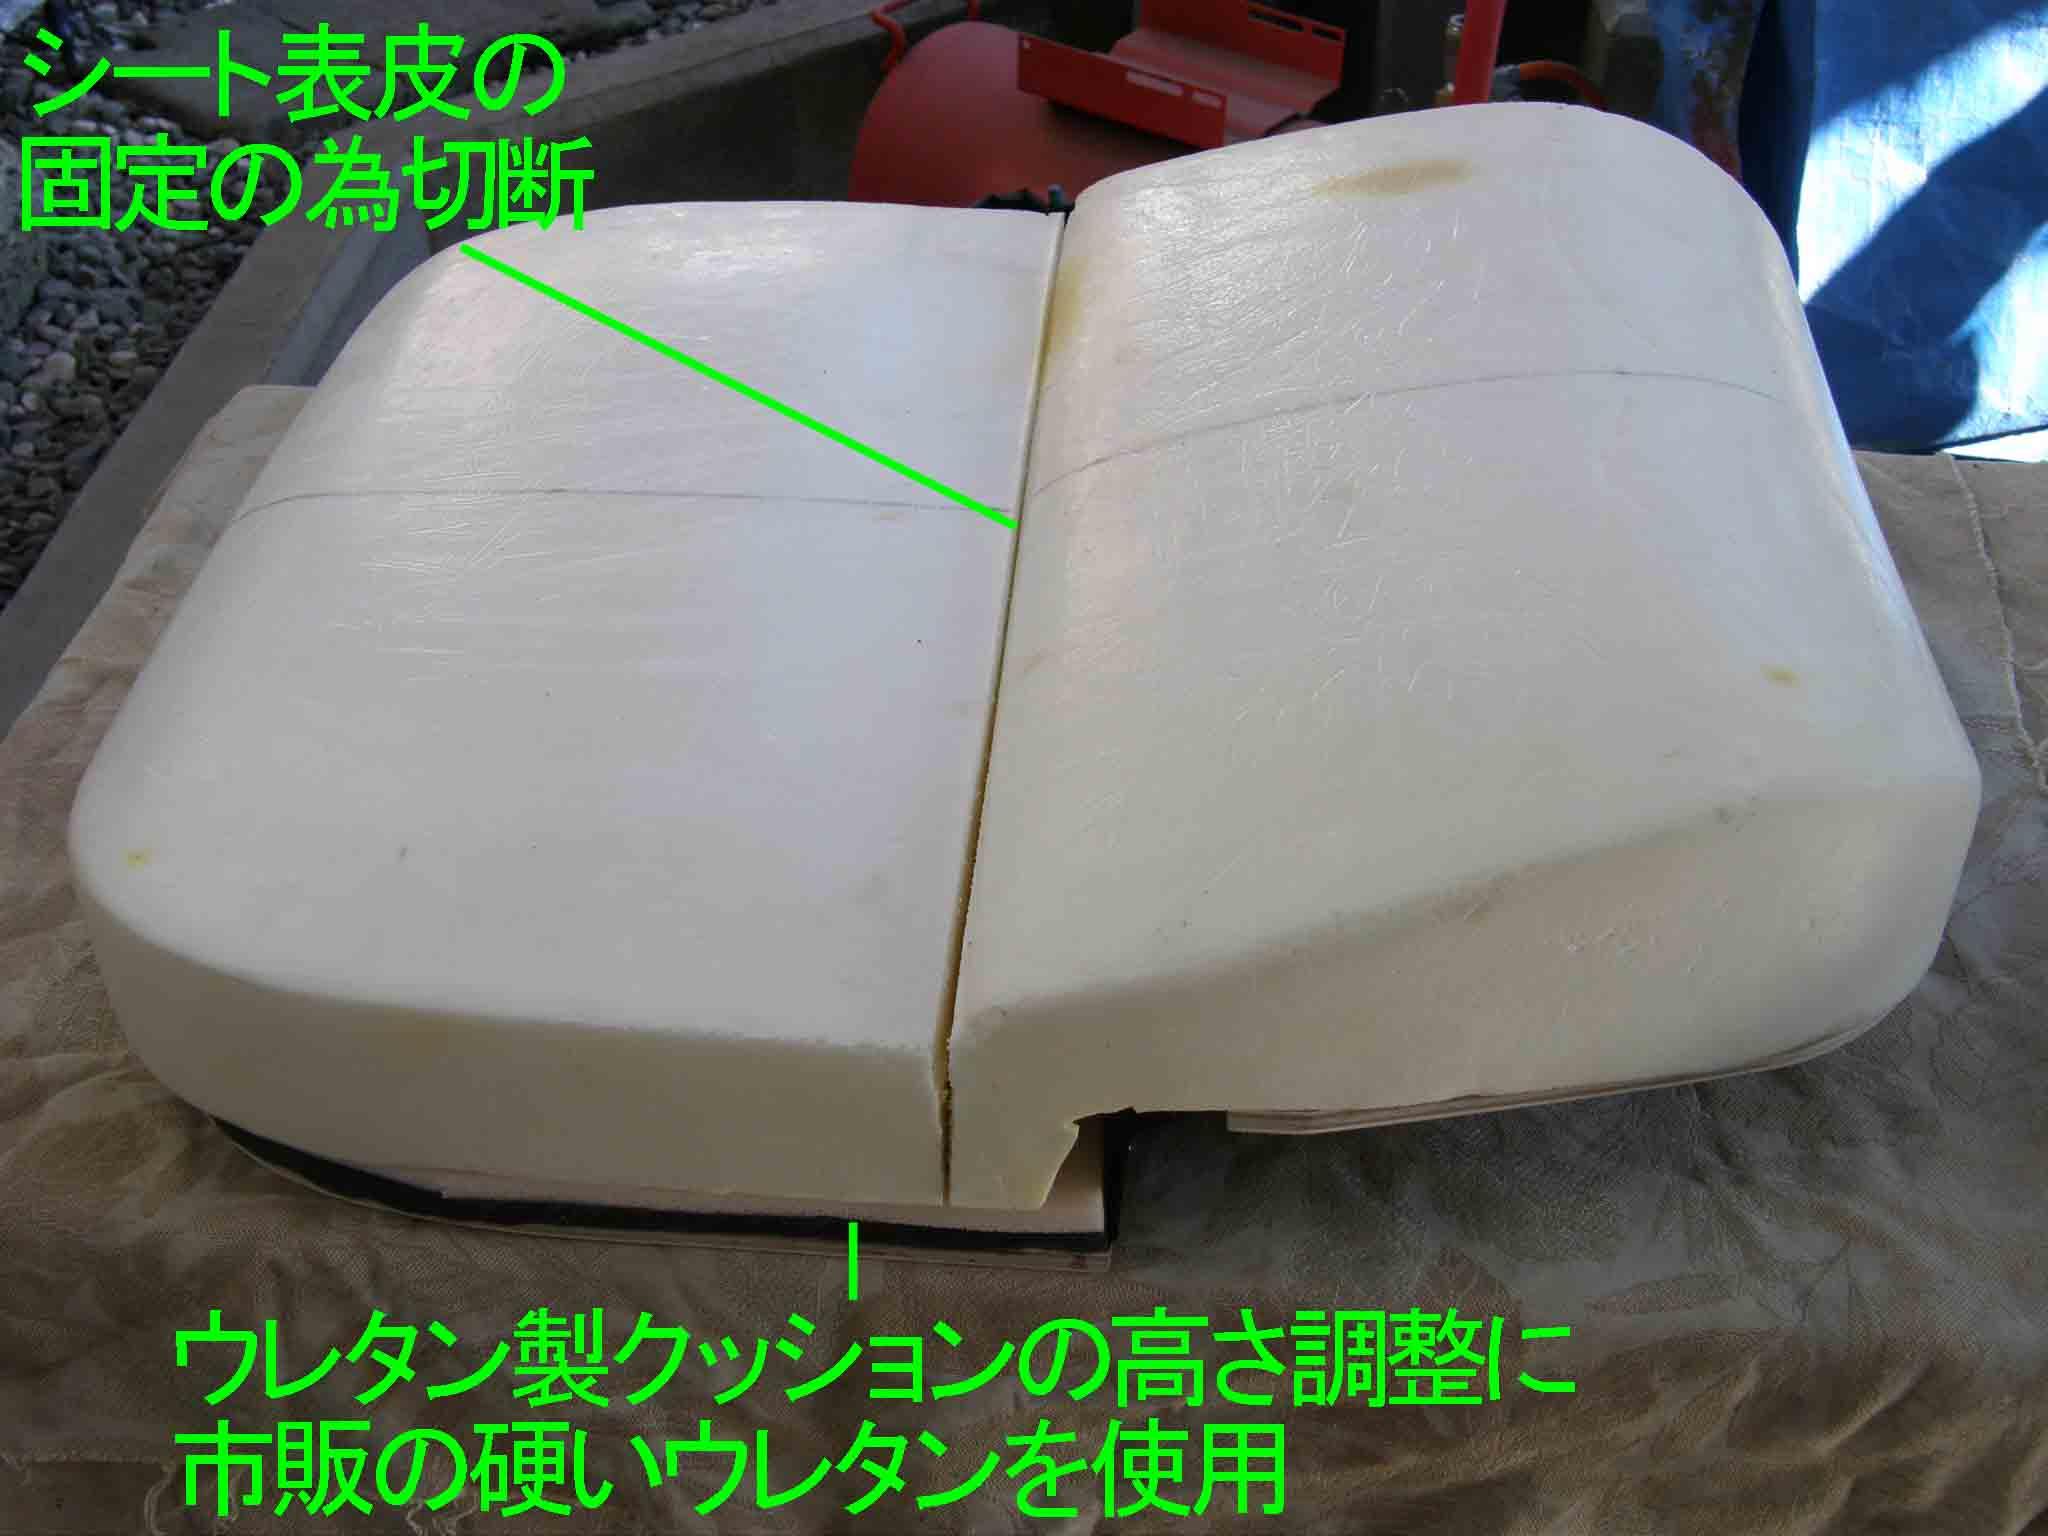 blogP1060230.jpg